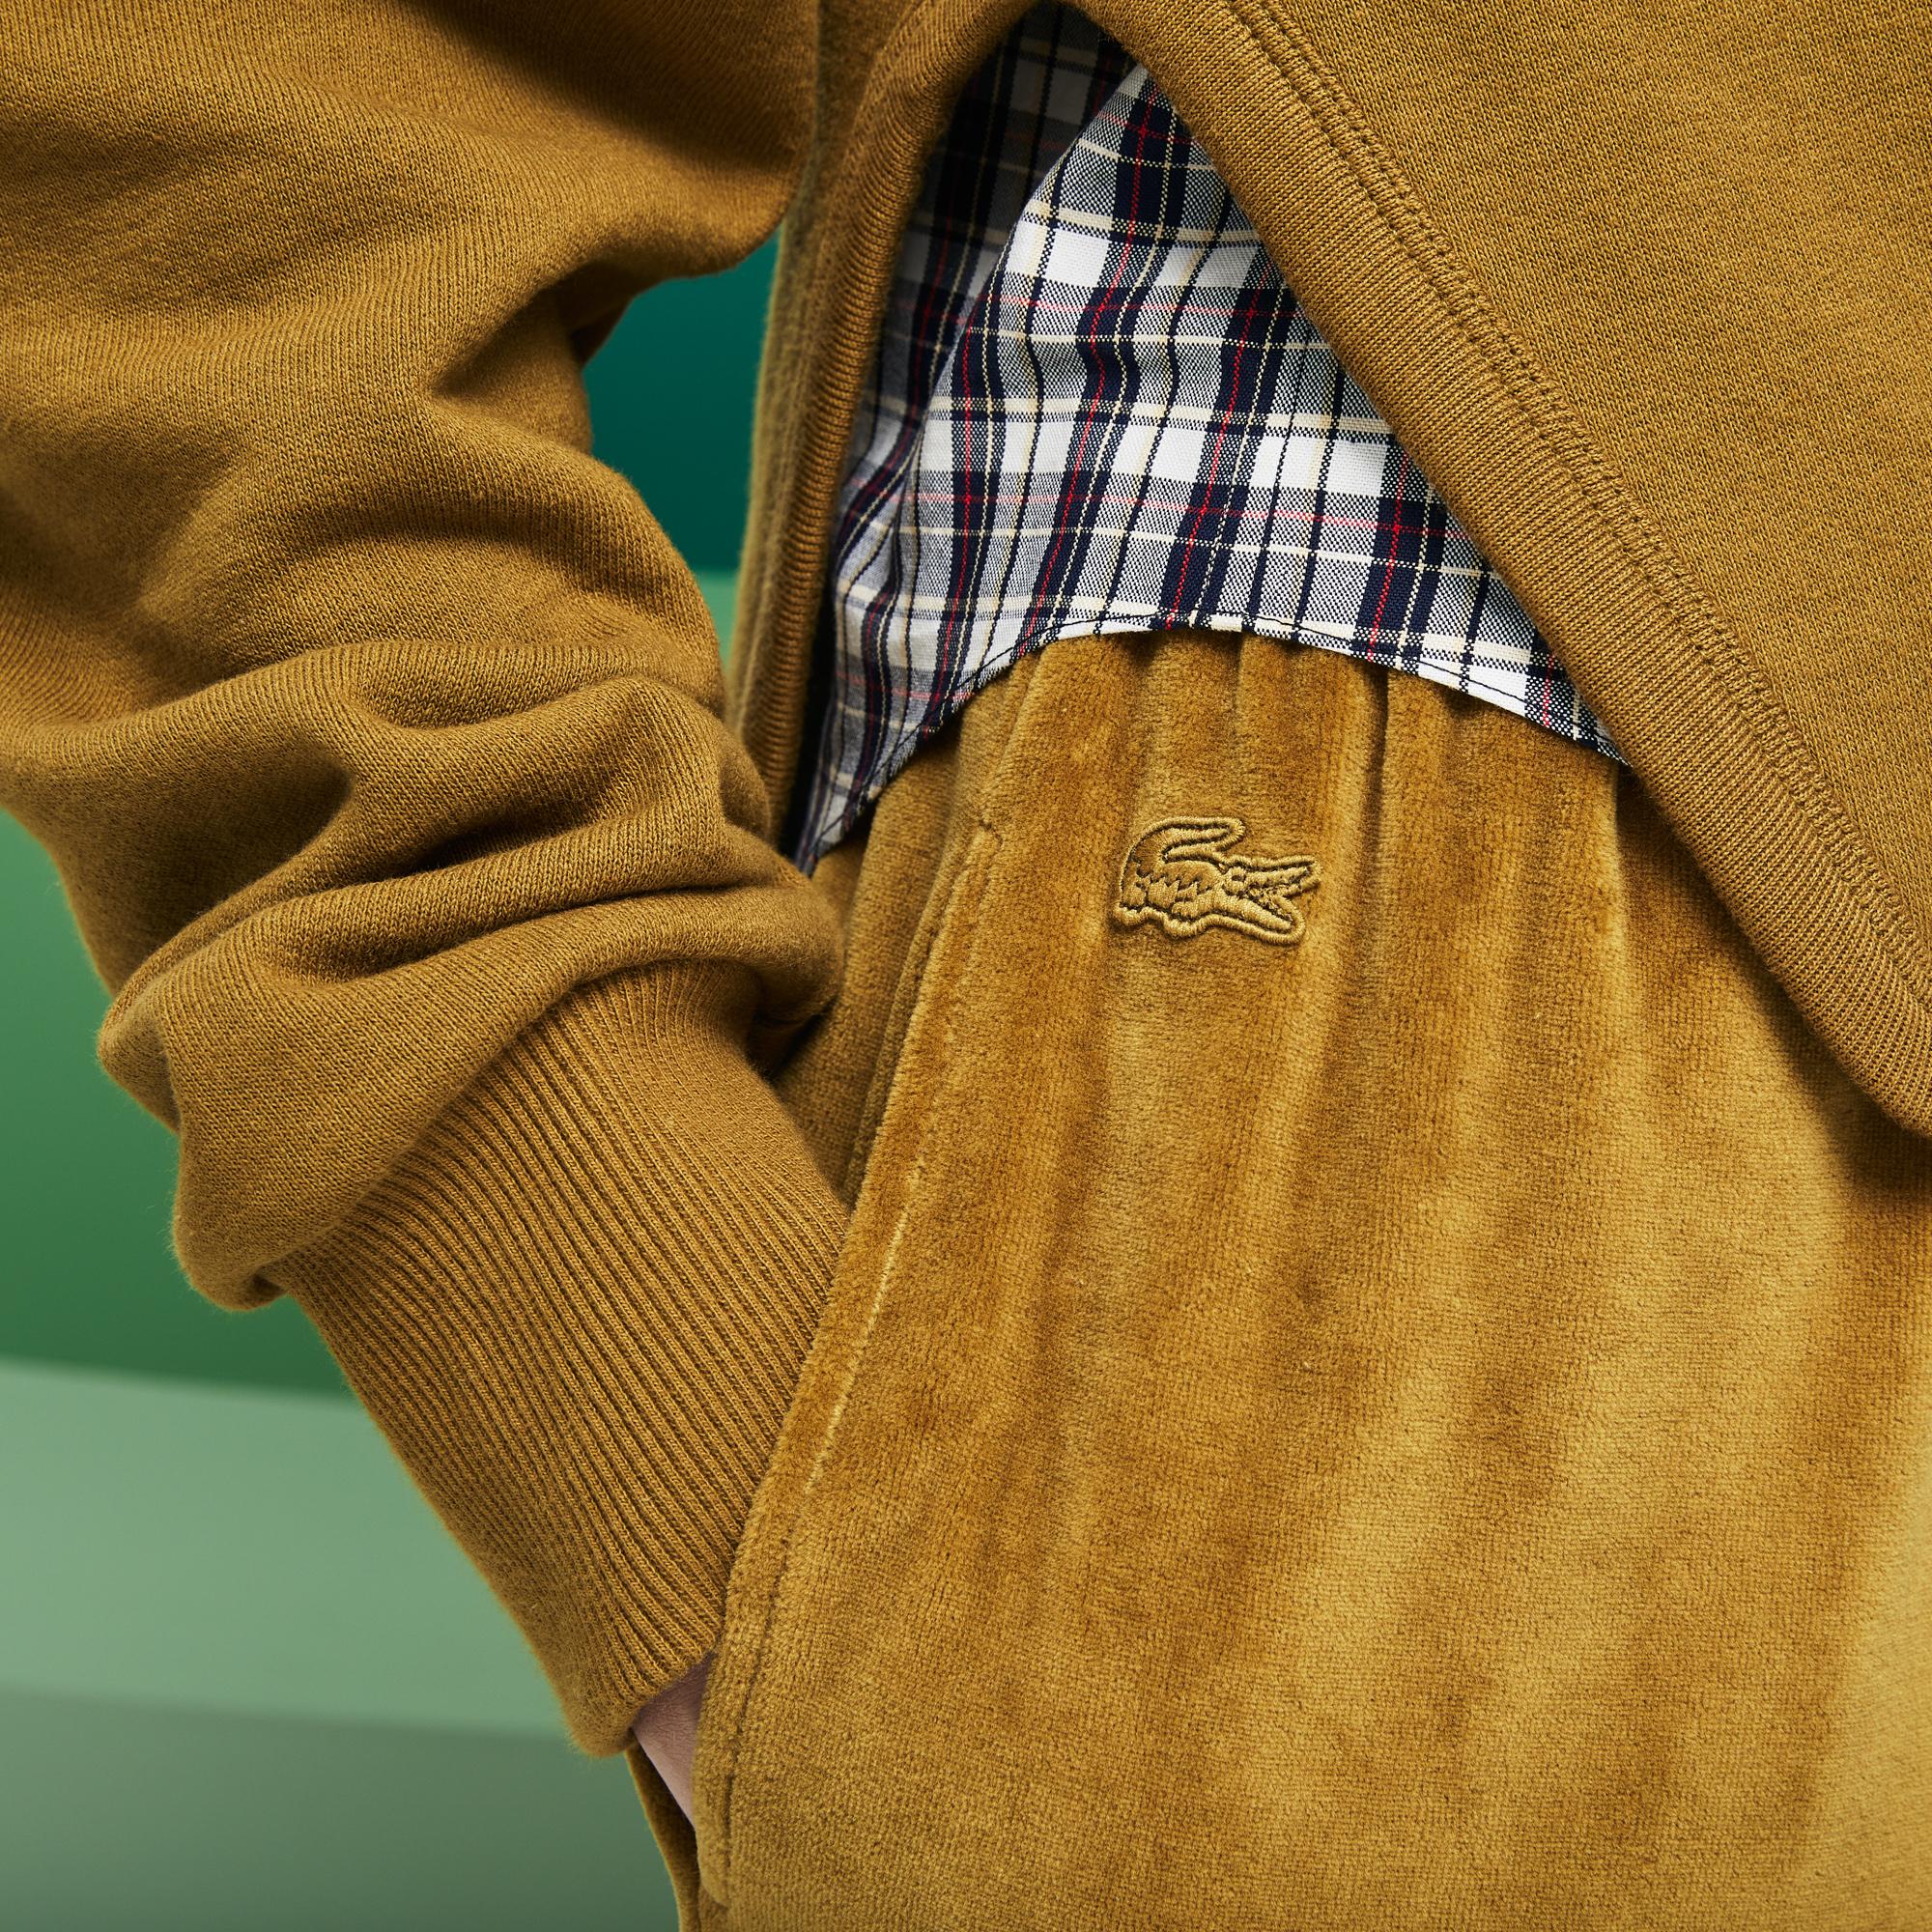 Фото 4 - Спортивные штаны Lacoste коричневого цвета